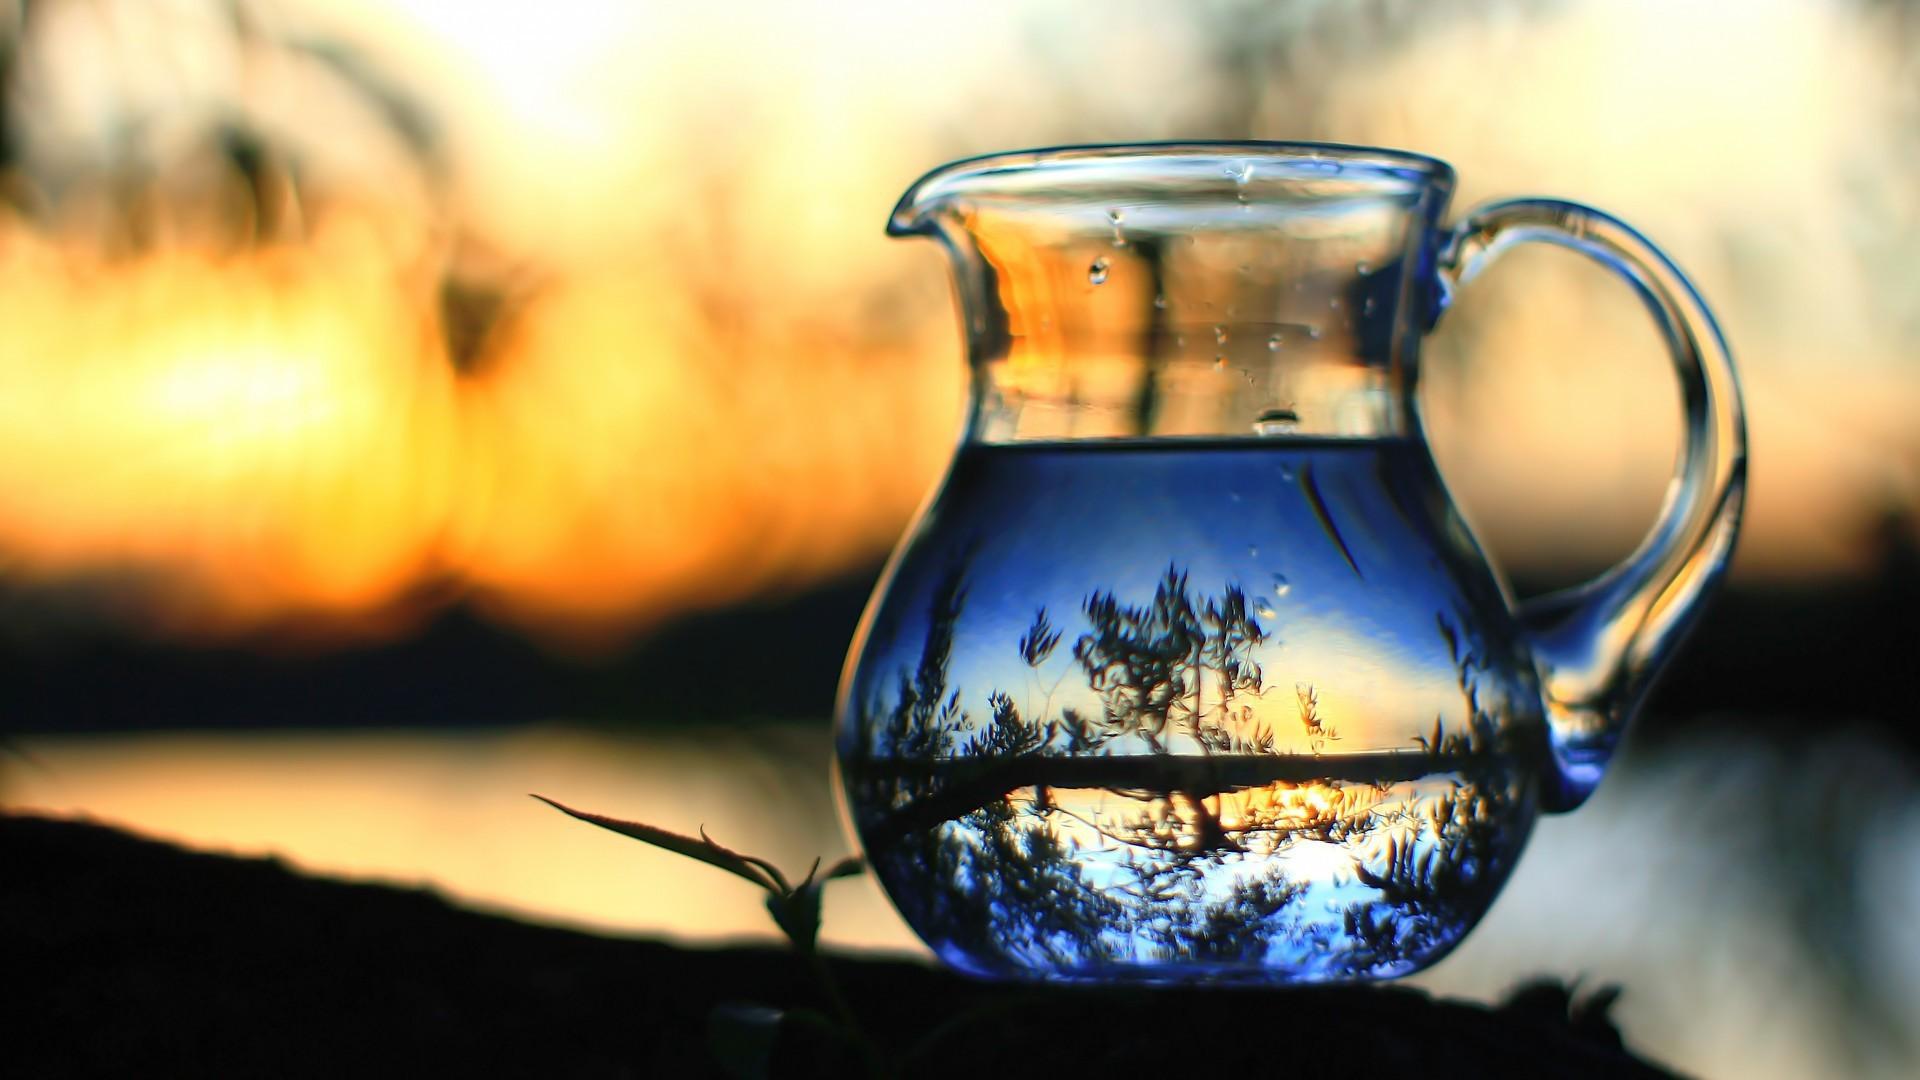 Love Jar Wallpaper : Glass Jar Desktop Wallpaper 49806 1920x1080 px ...